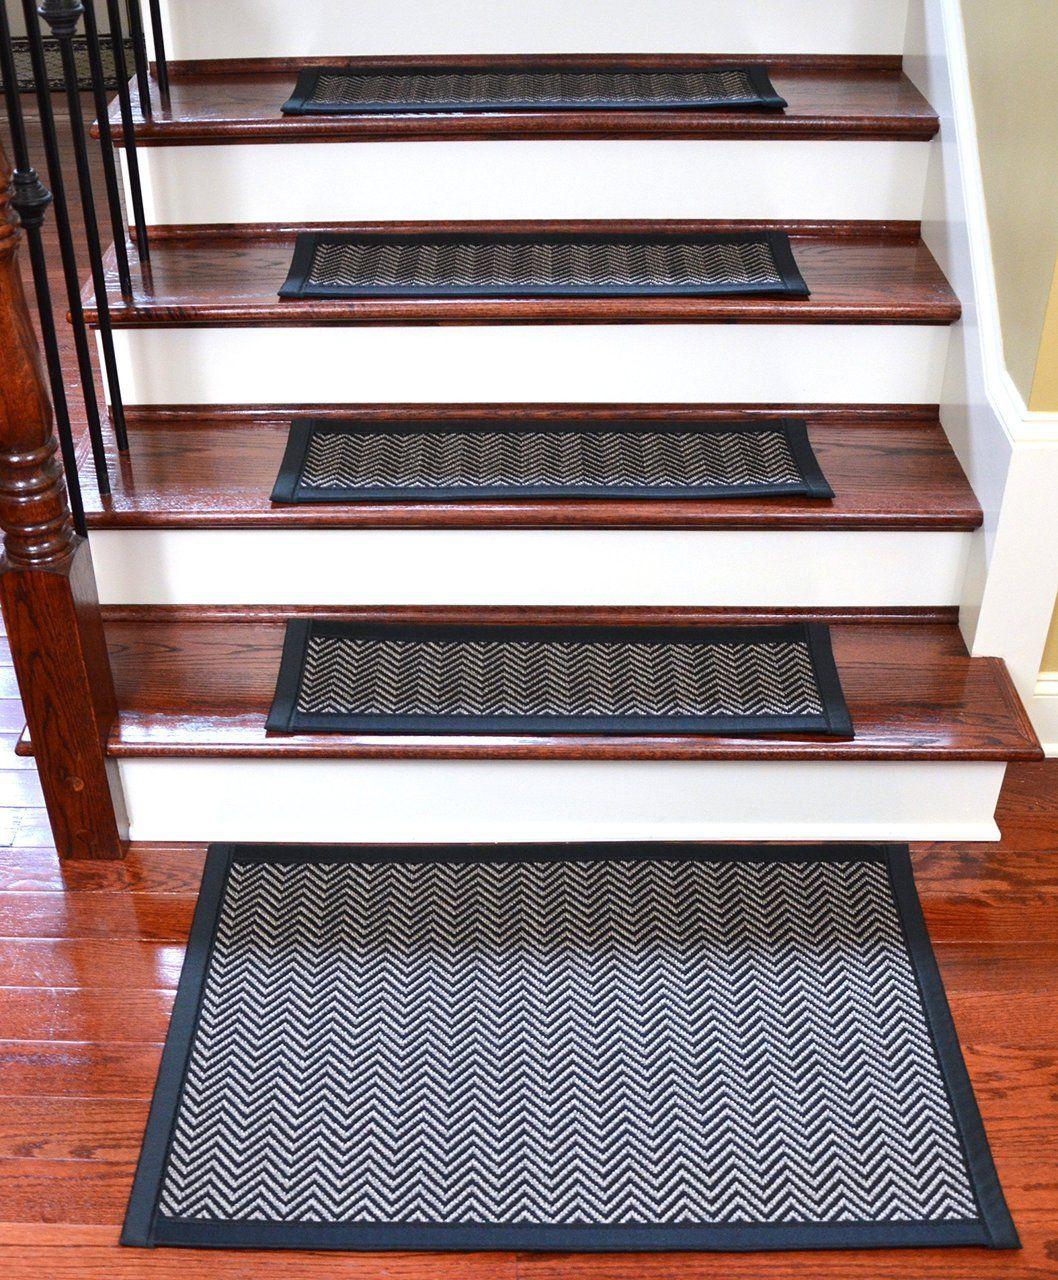 Dean Flooring Company Has 29X9 Chevron Black Hatteras Flatweave | Outdoor Carpet Stair Treads | Indoor Outdoor | Flooring | Ottomanson Jardin | Non Skid | Anti Slip